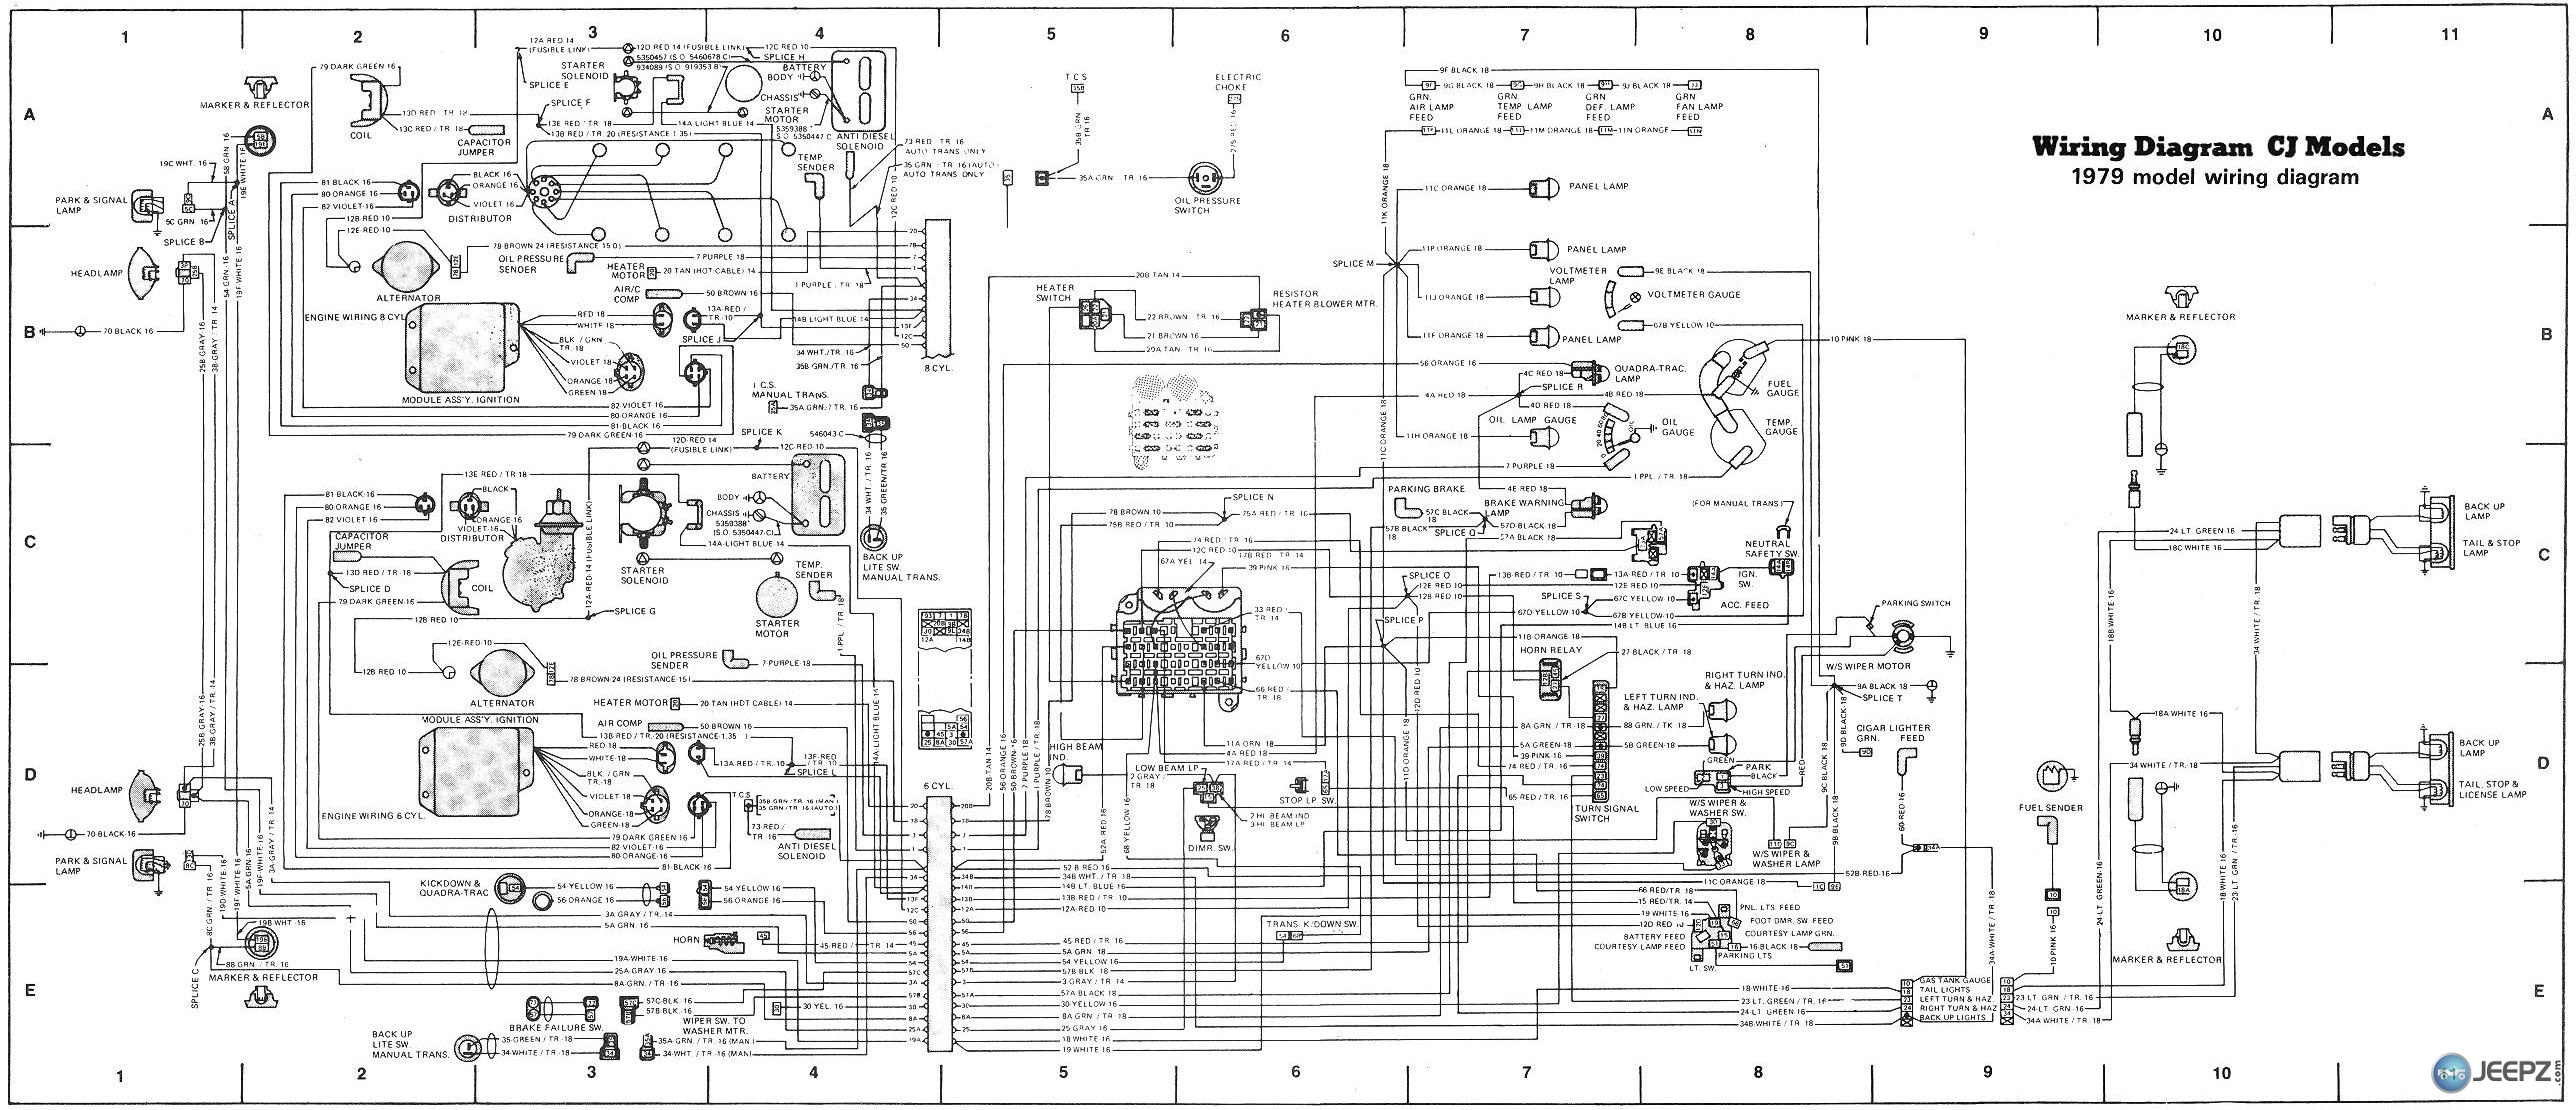 1977 Cj5 Ignition Wiring Diagram -2013 Toyota Tacoma Remote Start Wiring  Diagram | Begeboy Wiring Diagram Source | Cj5 Ignition Wiring Diagram |  | Begeboy Wiring Diagram Source